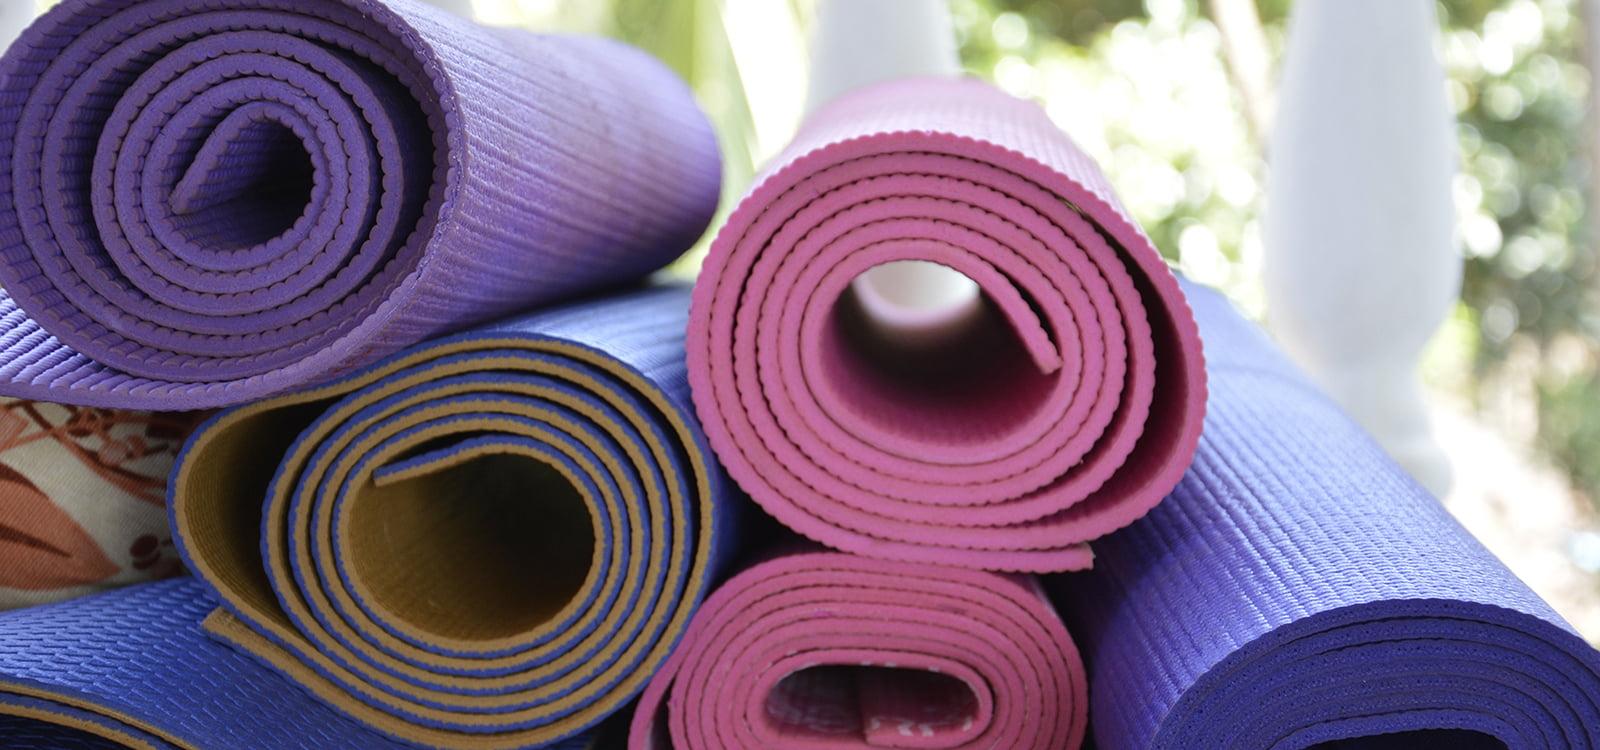 evia yoga solingen bunte yogamatten gerollt gestapelt